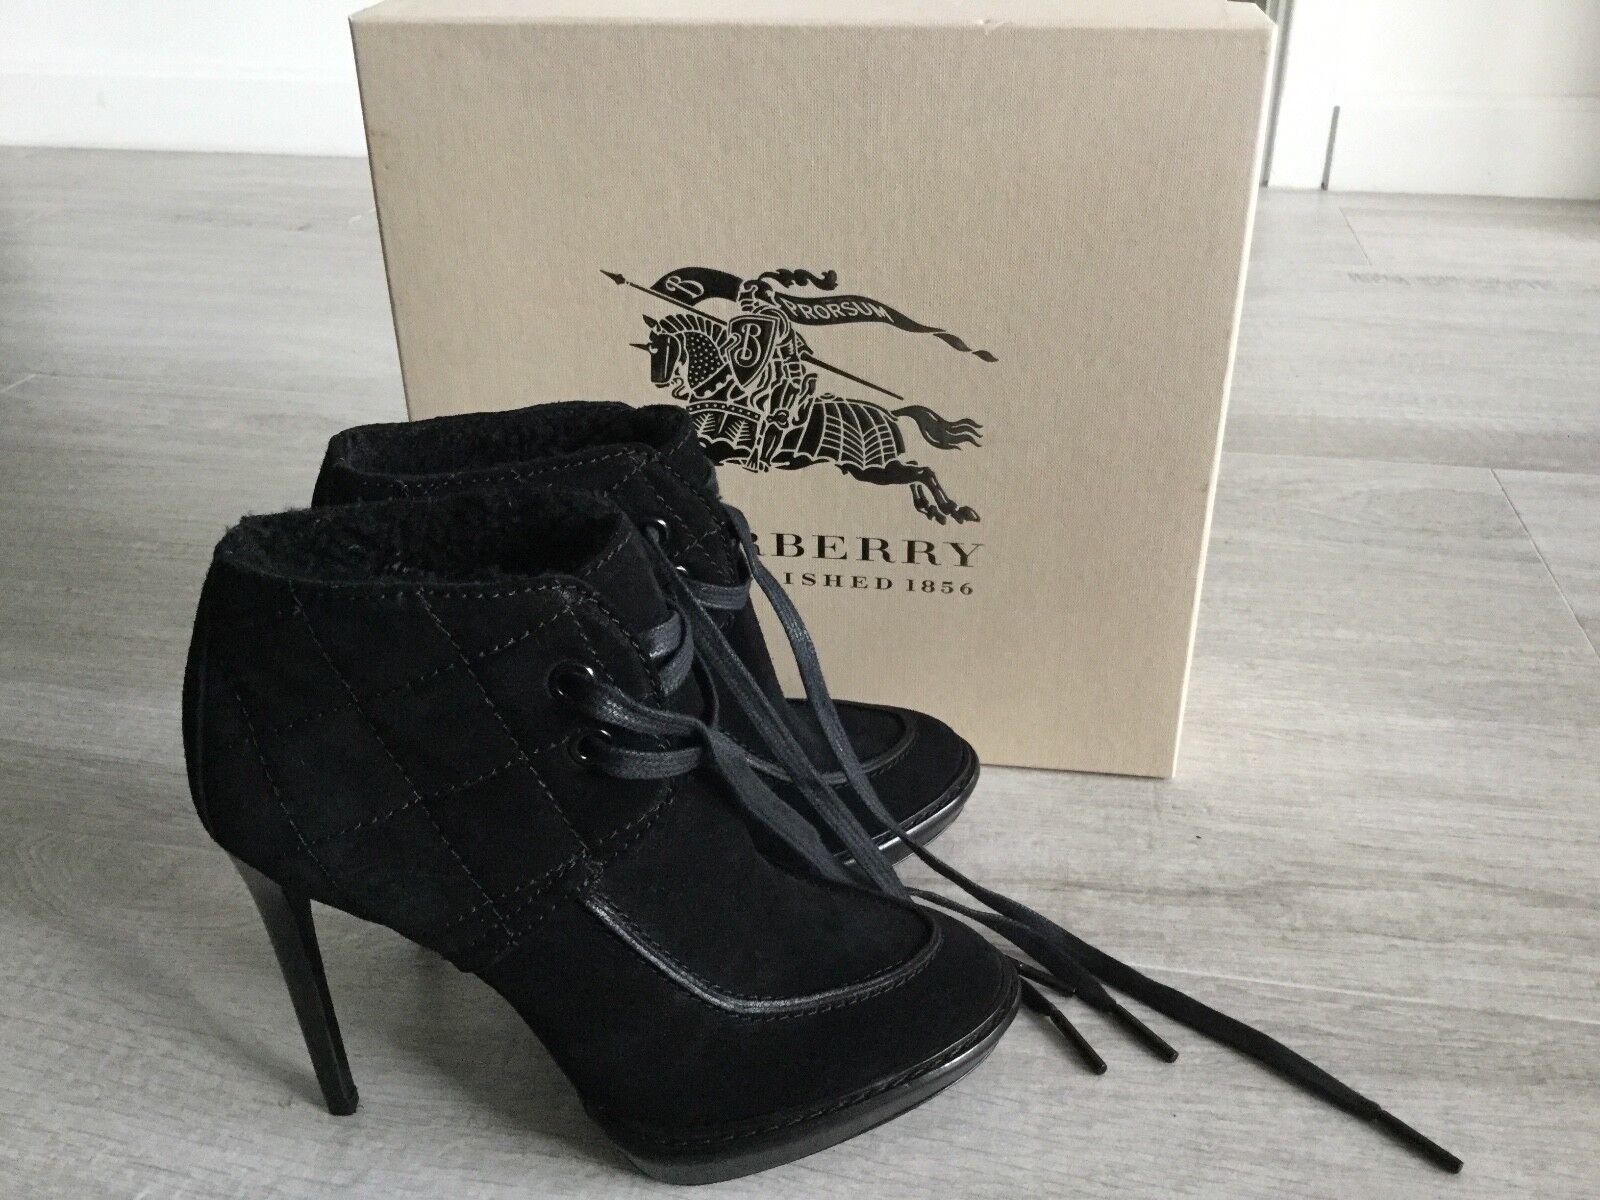 NIB BURBERRY PRORSUM mujer  995 SUEDE furs ANKLE ANKLE ANKLE botas SZ US 7.5 EU 37.5  venta de ofertas